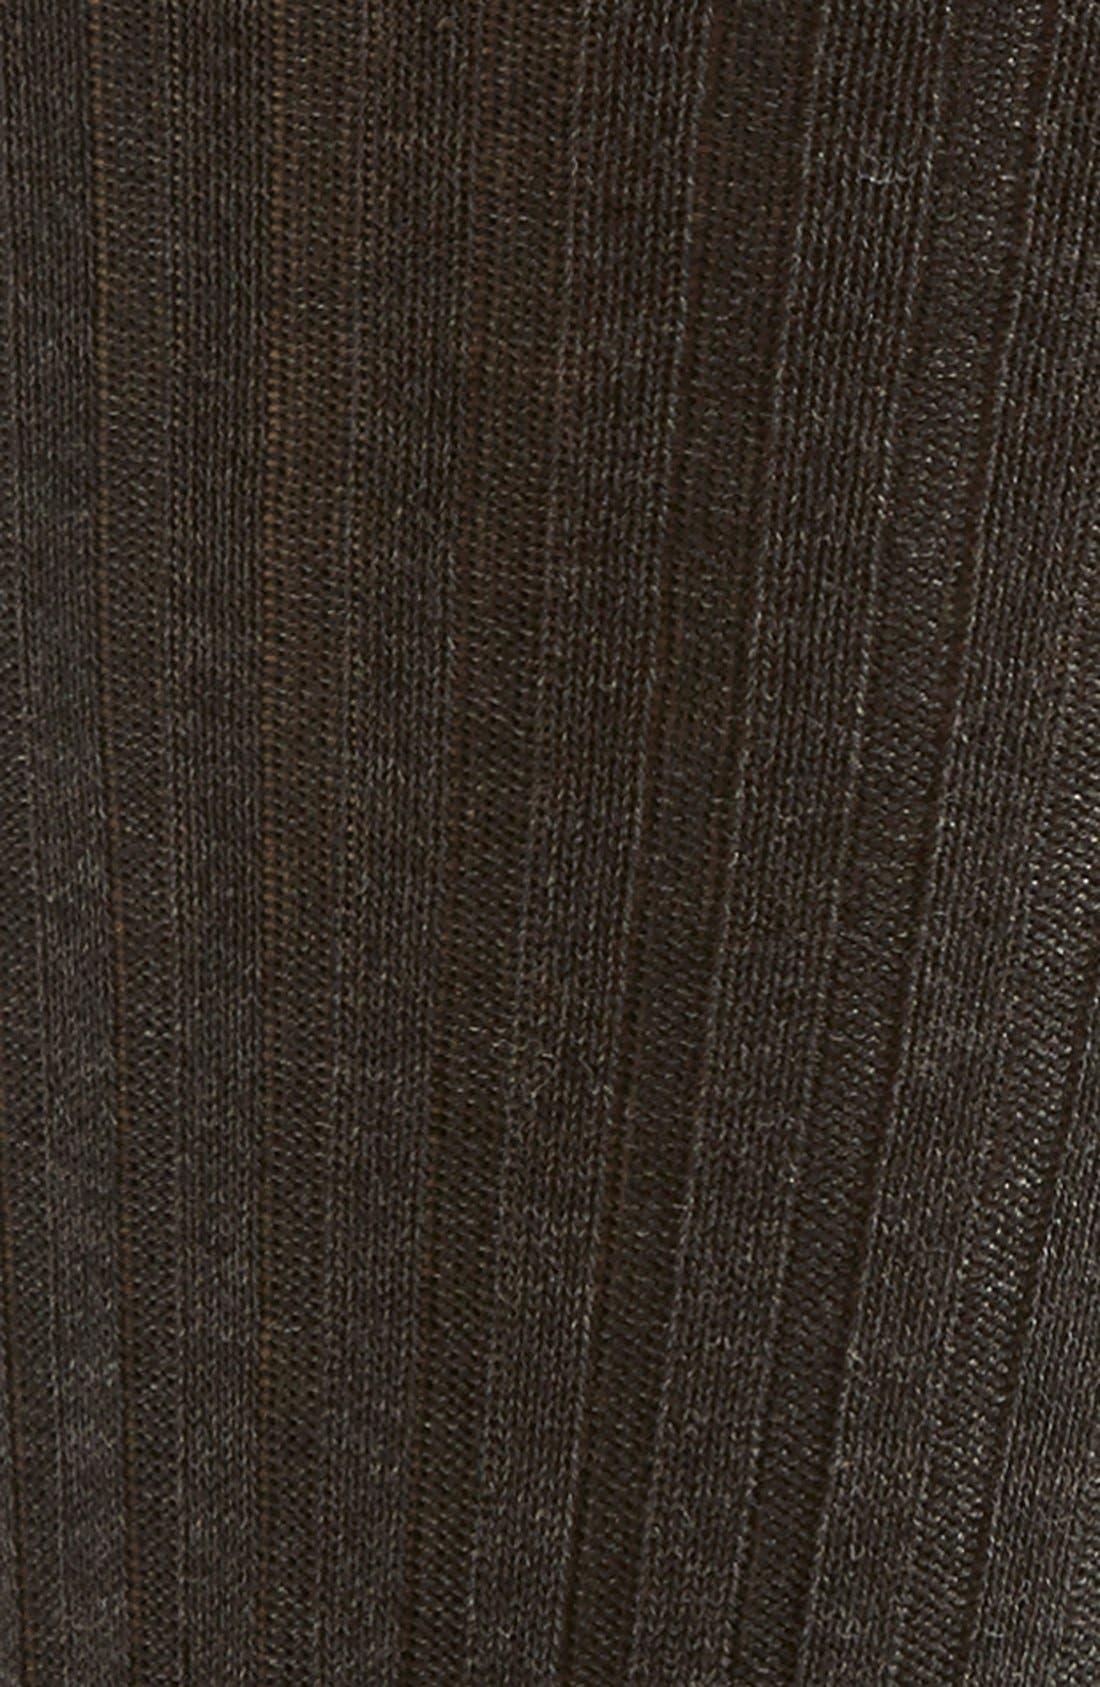 Cotton Blend Mid Calf Dress Socks,                             Alternate thumbnail 2, color,                             DARK GREY 08